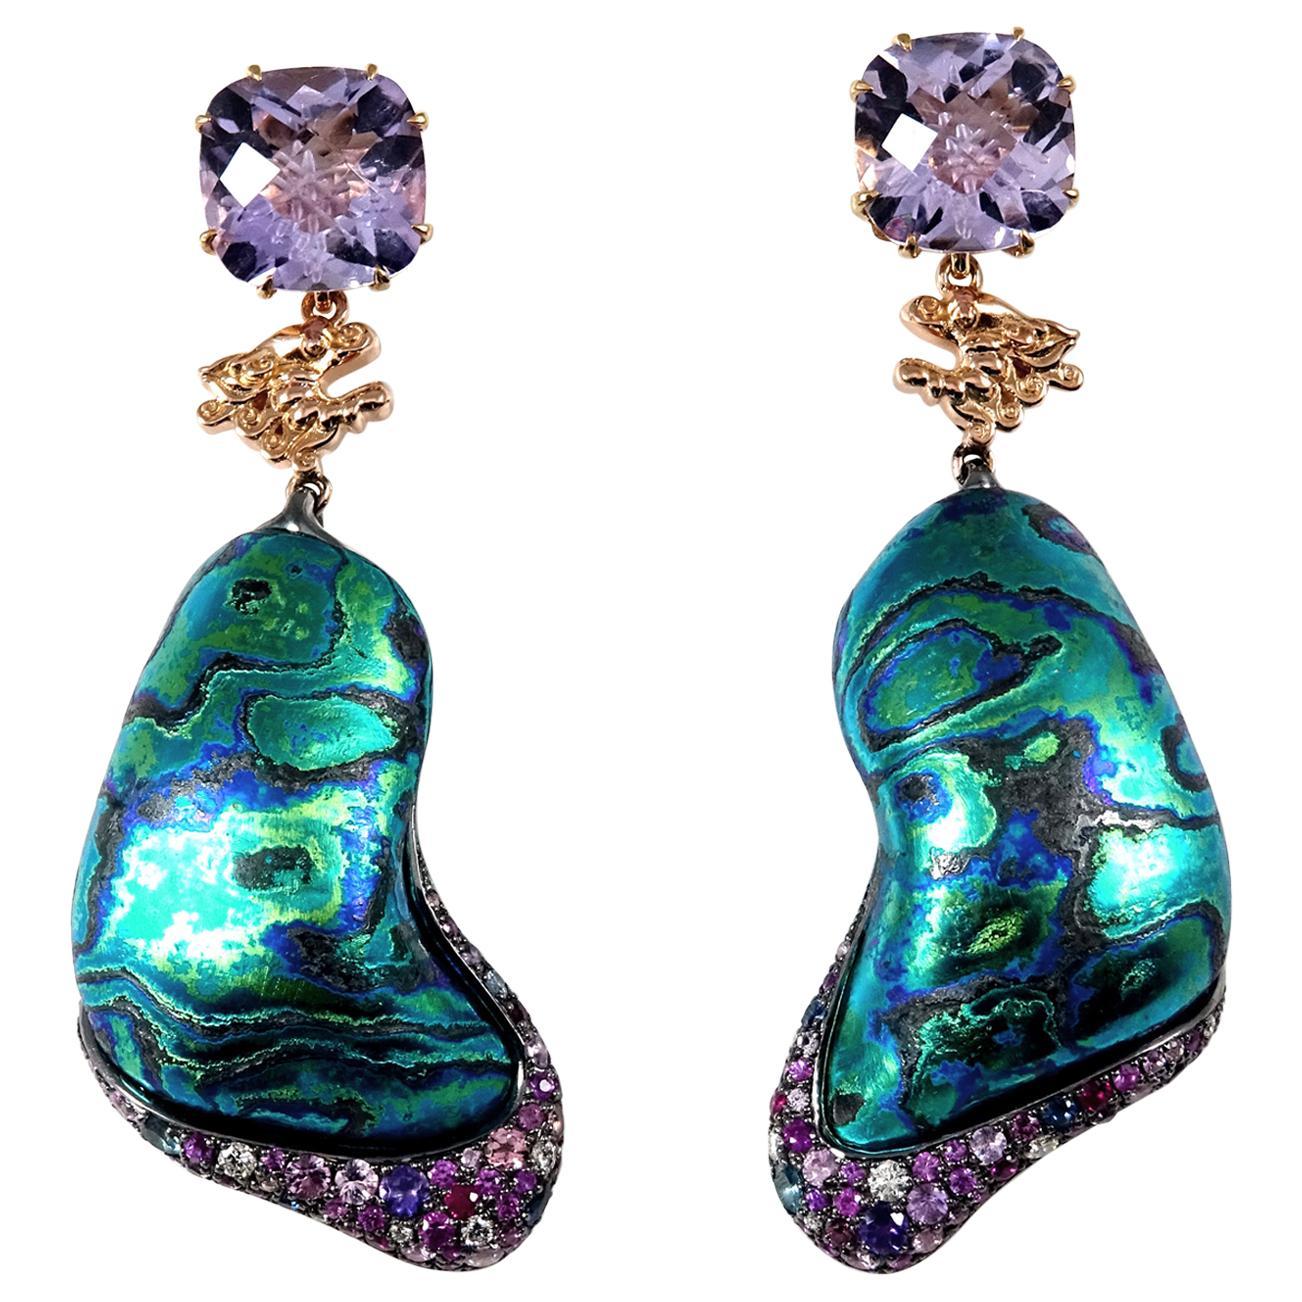 Diamonds Amethysts Sapphires 18 Karat Gold Sterling Silver Timascus Earrings